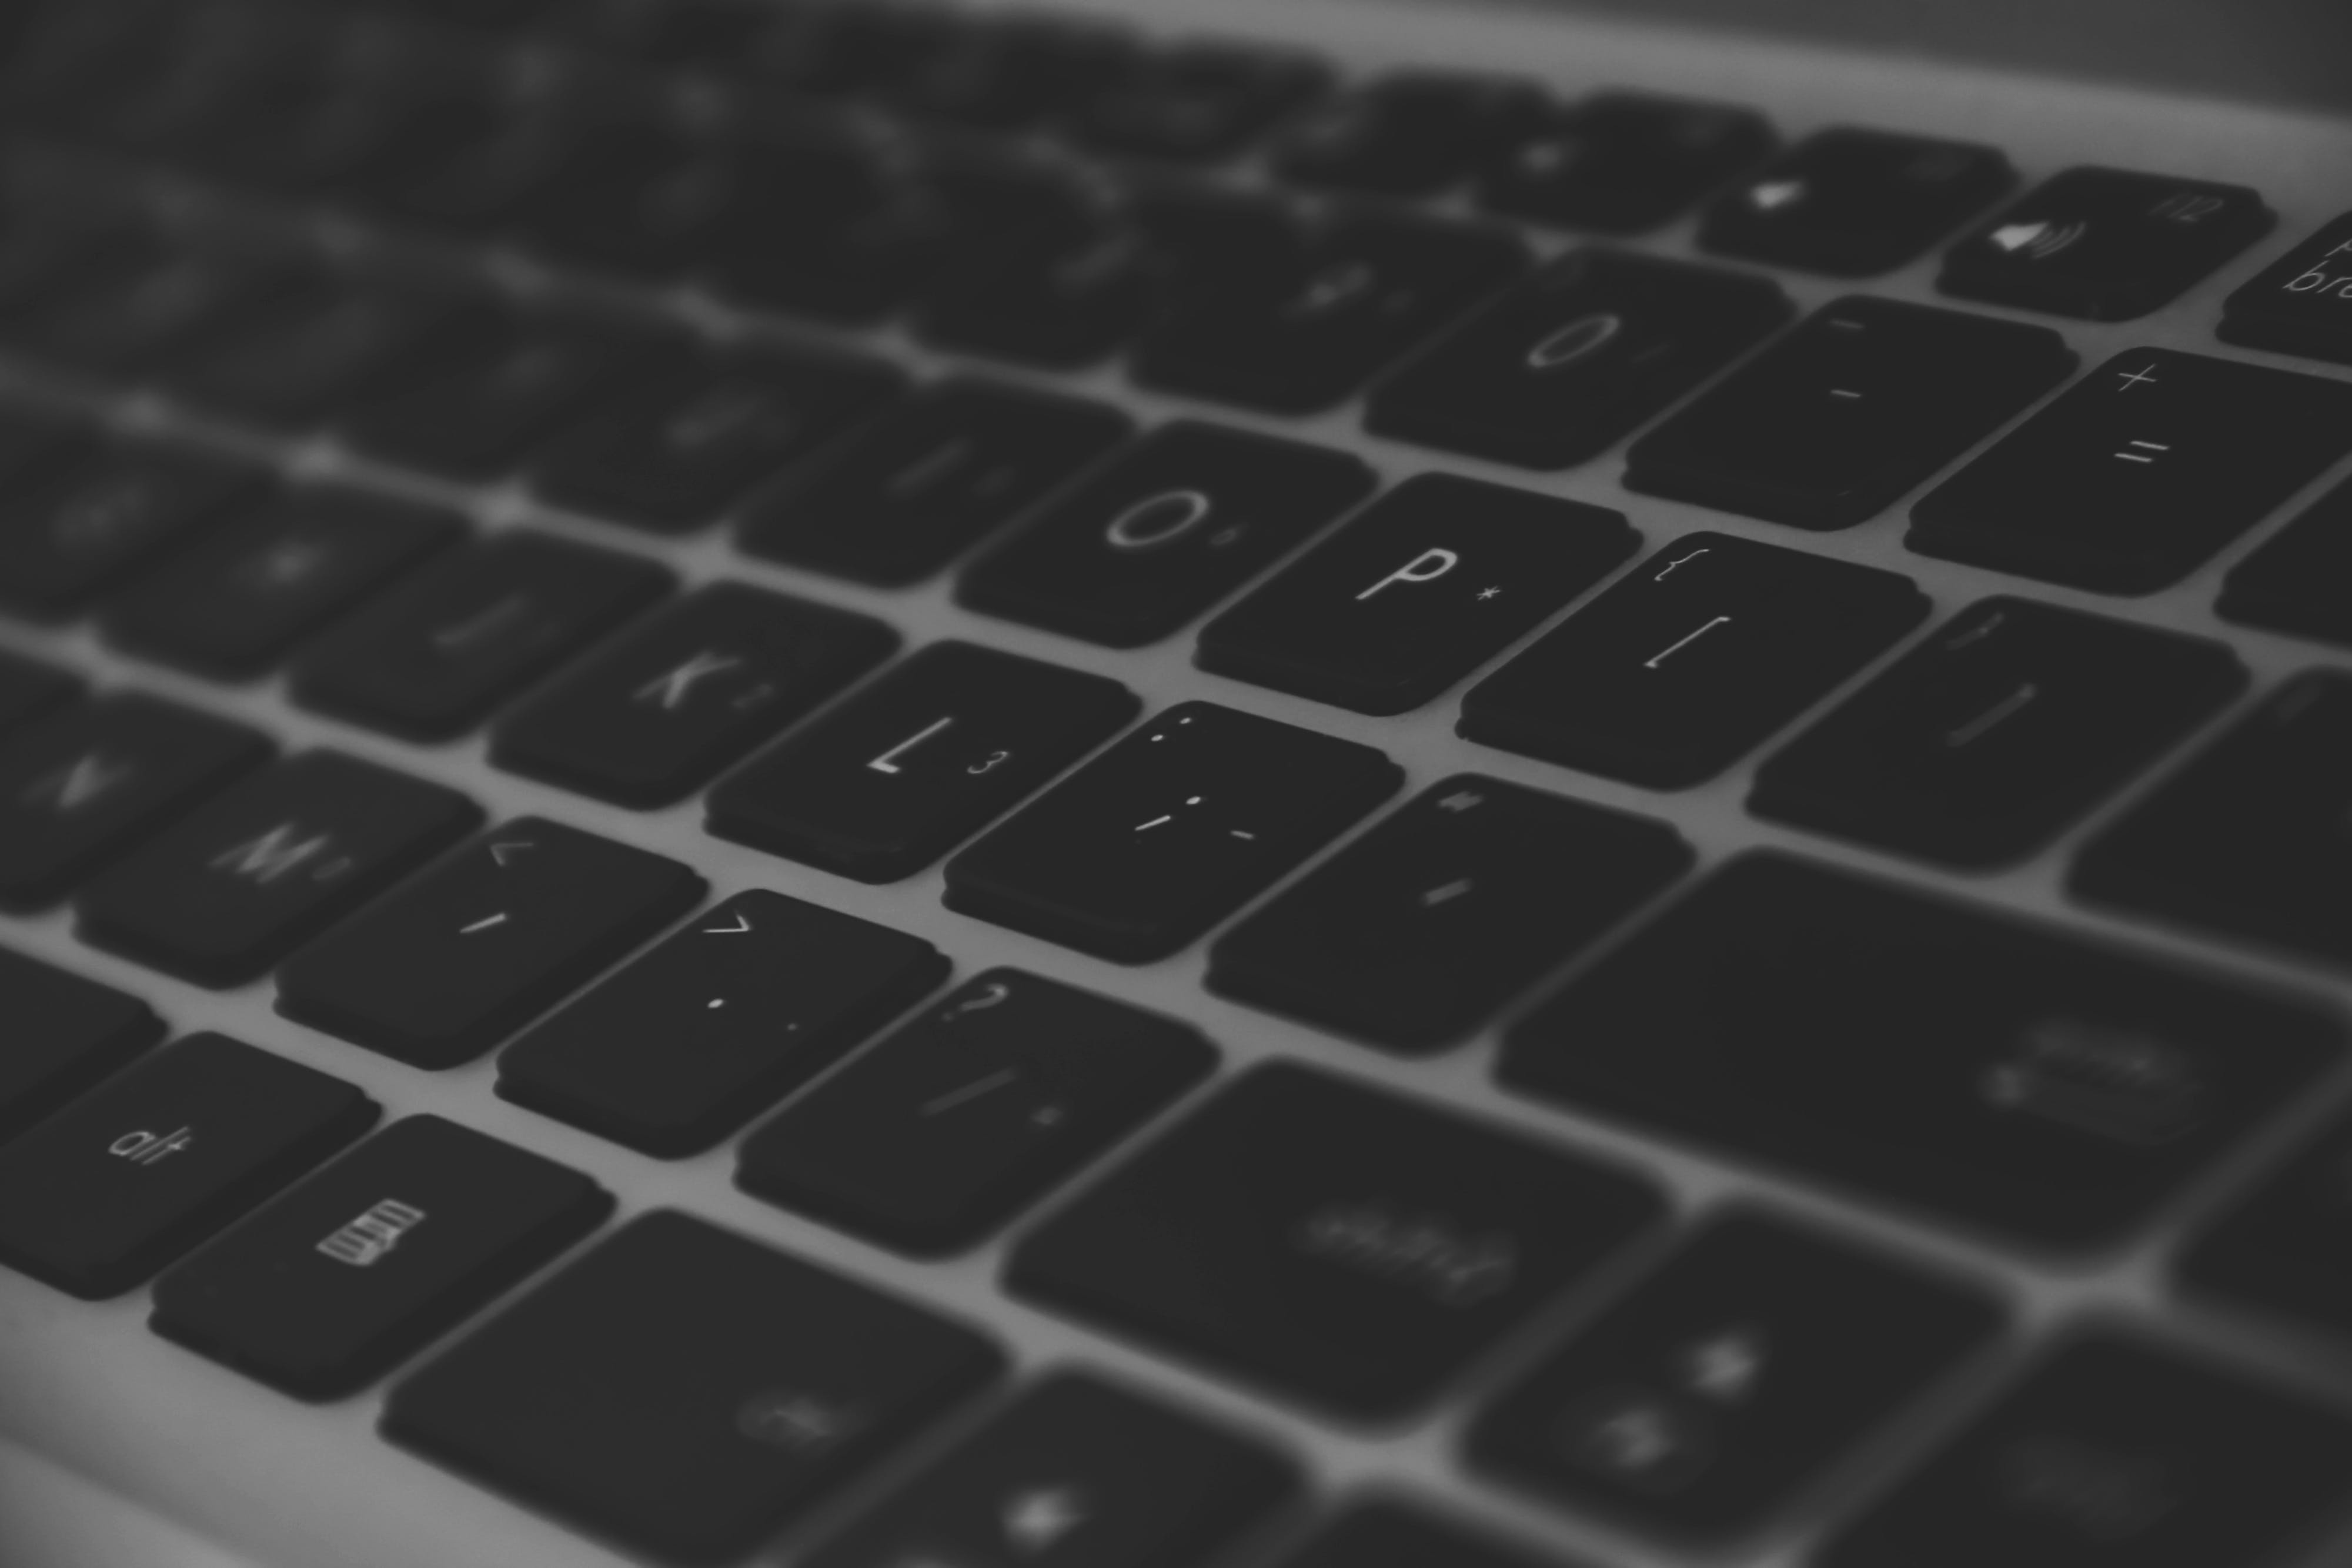 blur, close-up, computer keyboard